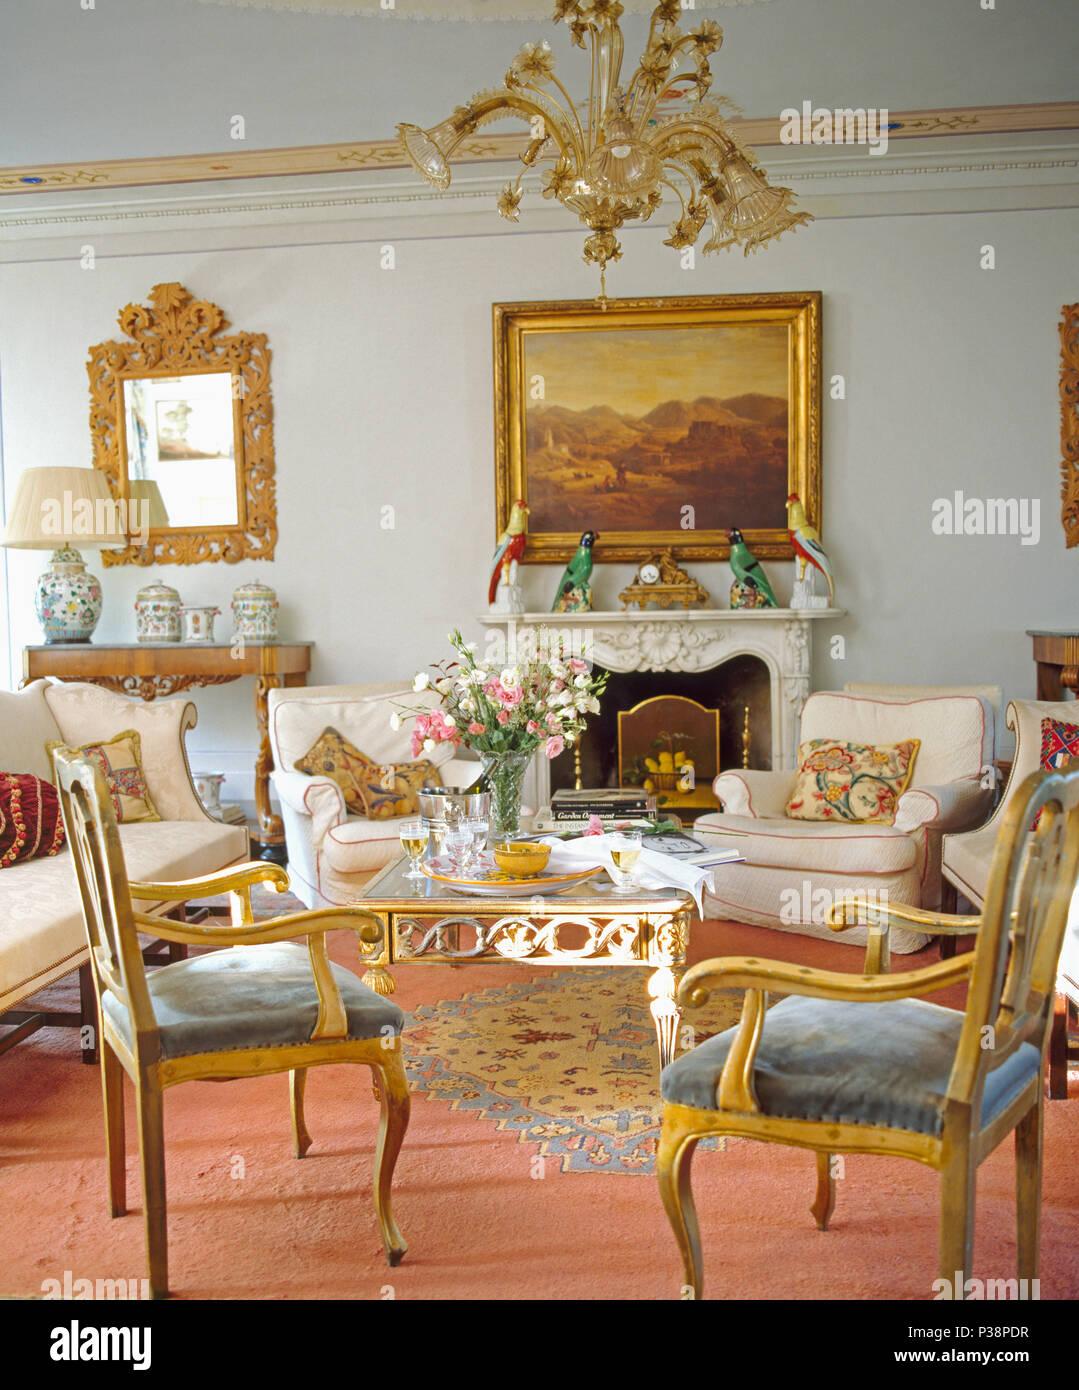 Grosses Bild Oben Im Toskanischen Kamin Salon Mit Goldgerahmten